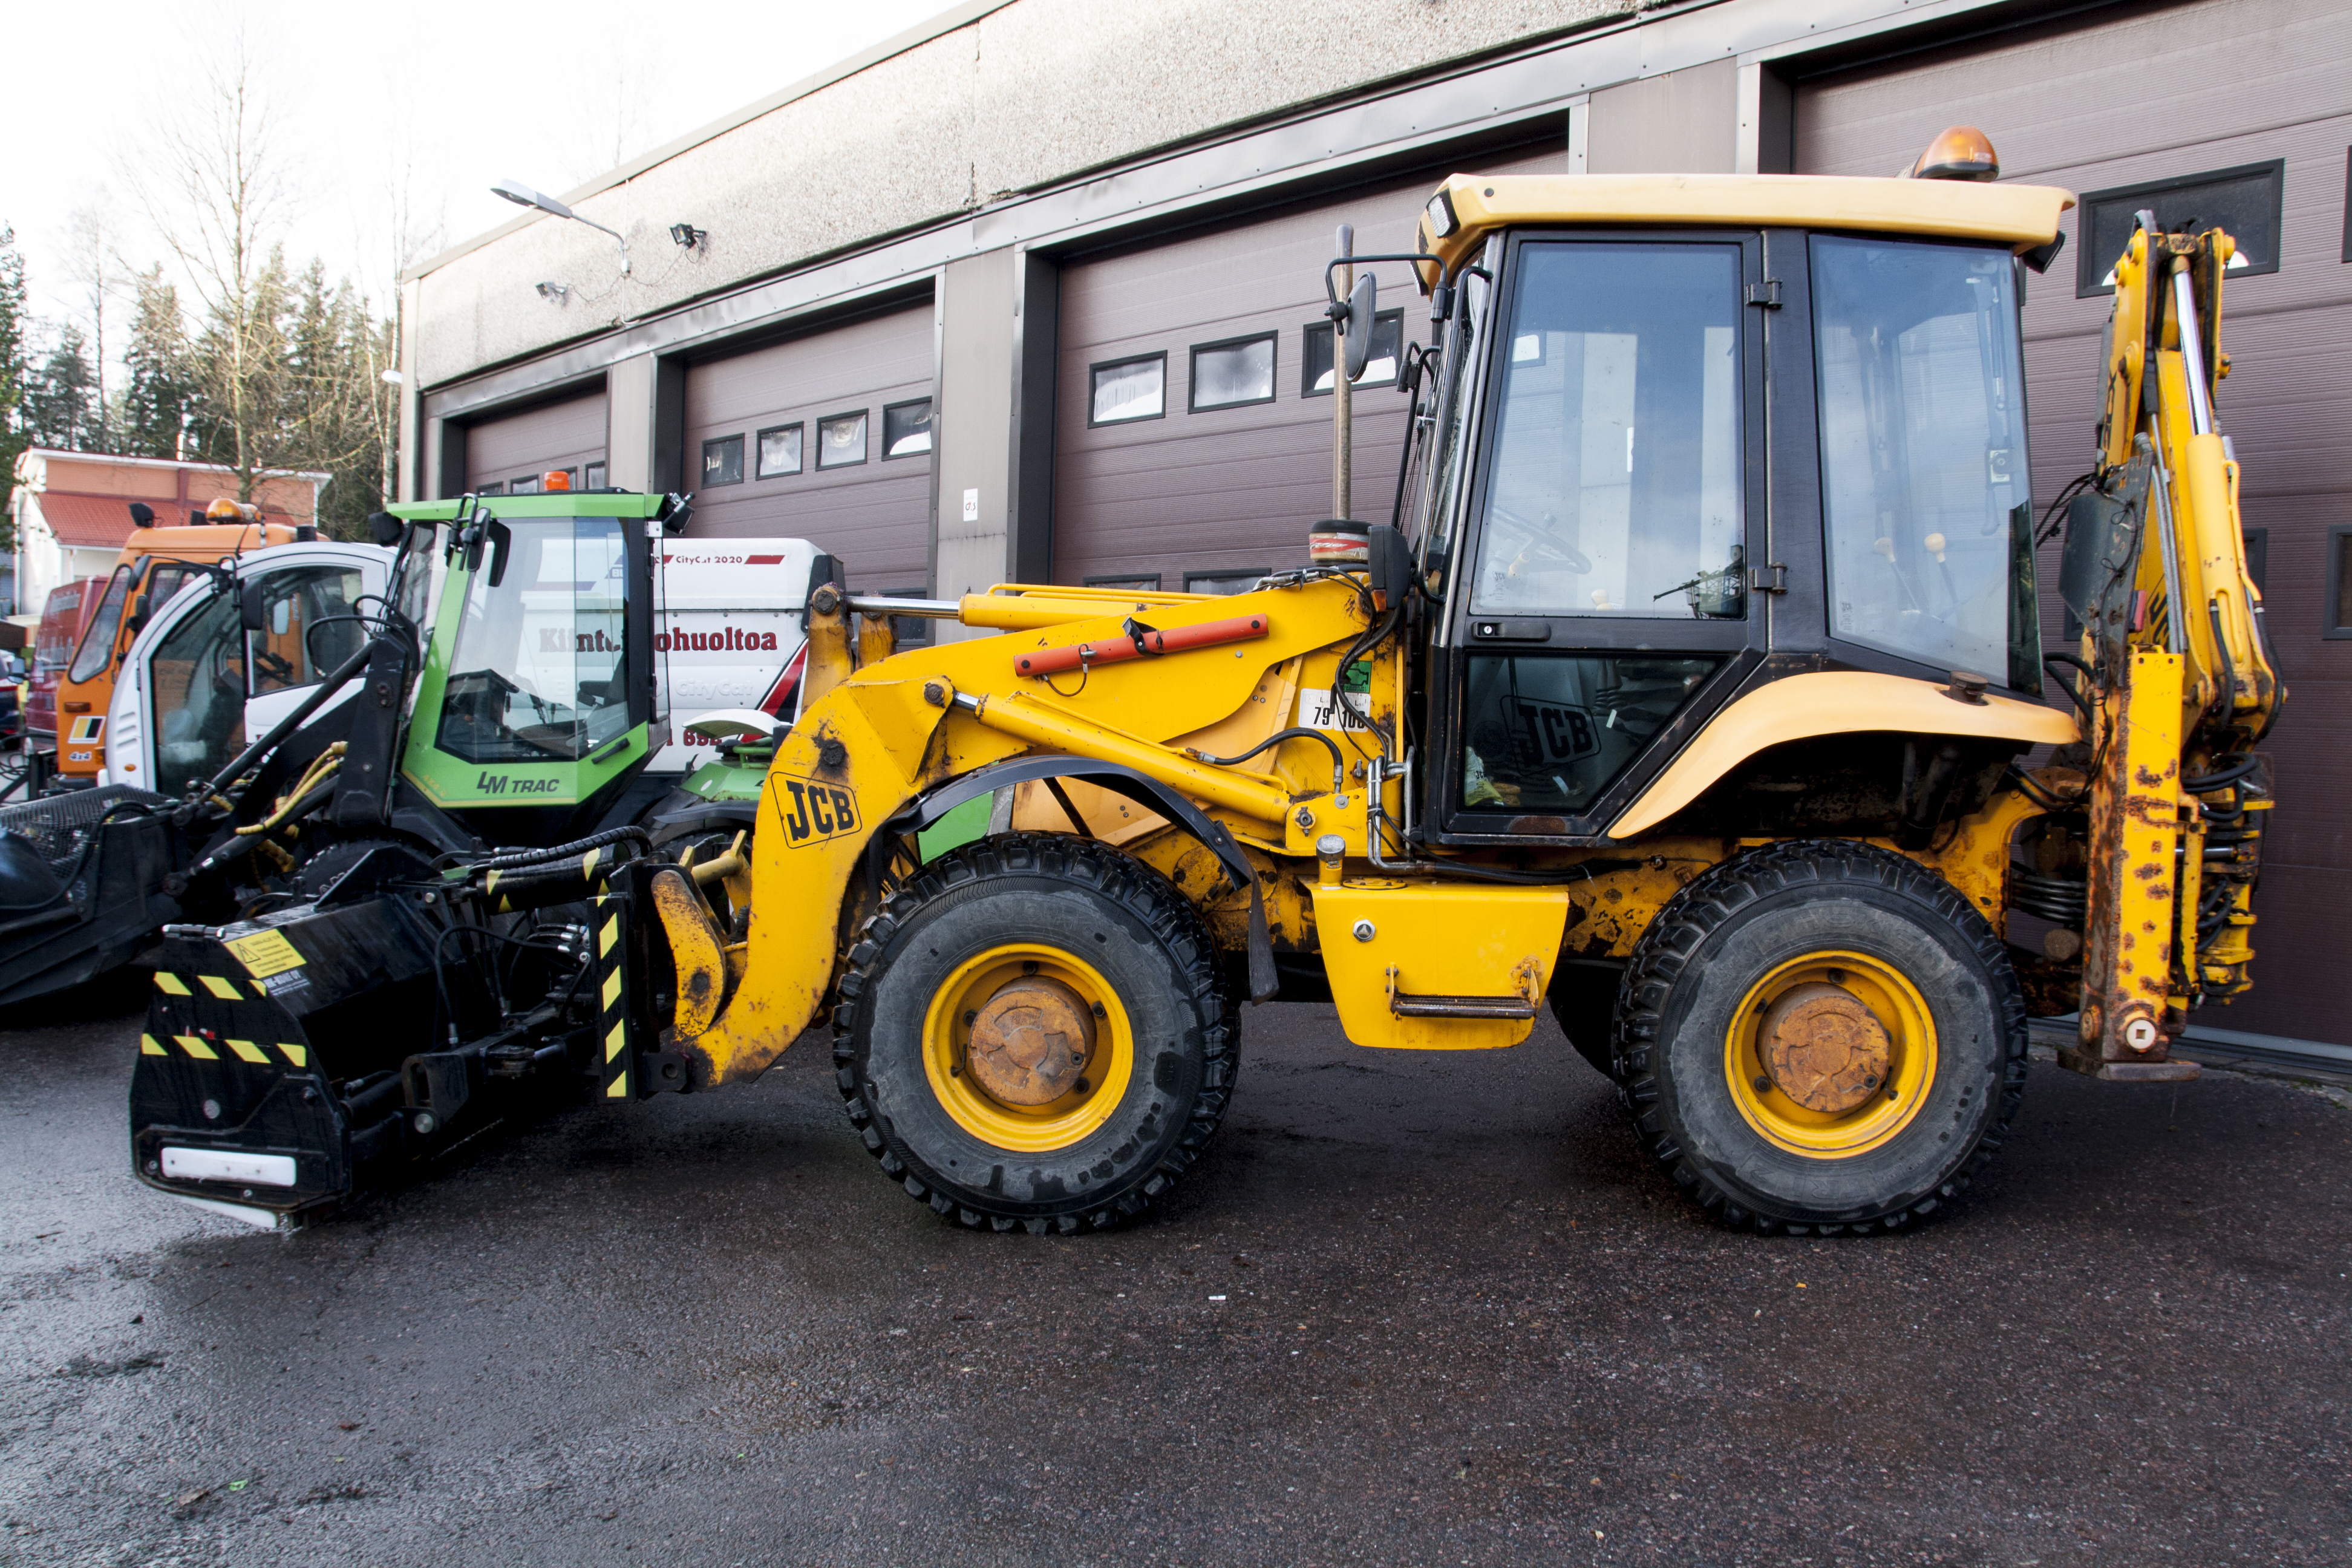 JCB 2CX Traktori-kaivuri, kauhalla, TOP-levy, kauhahiekotin